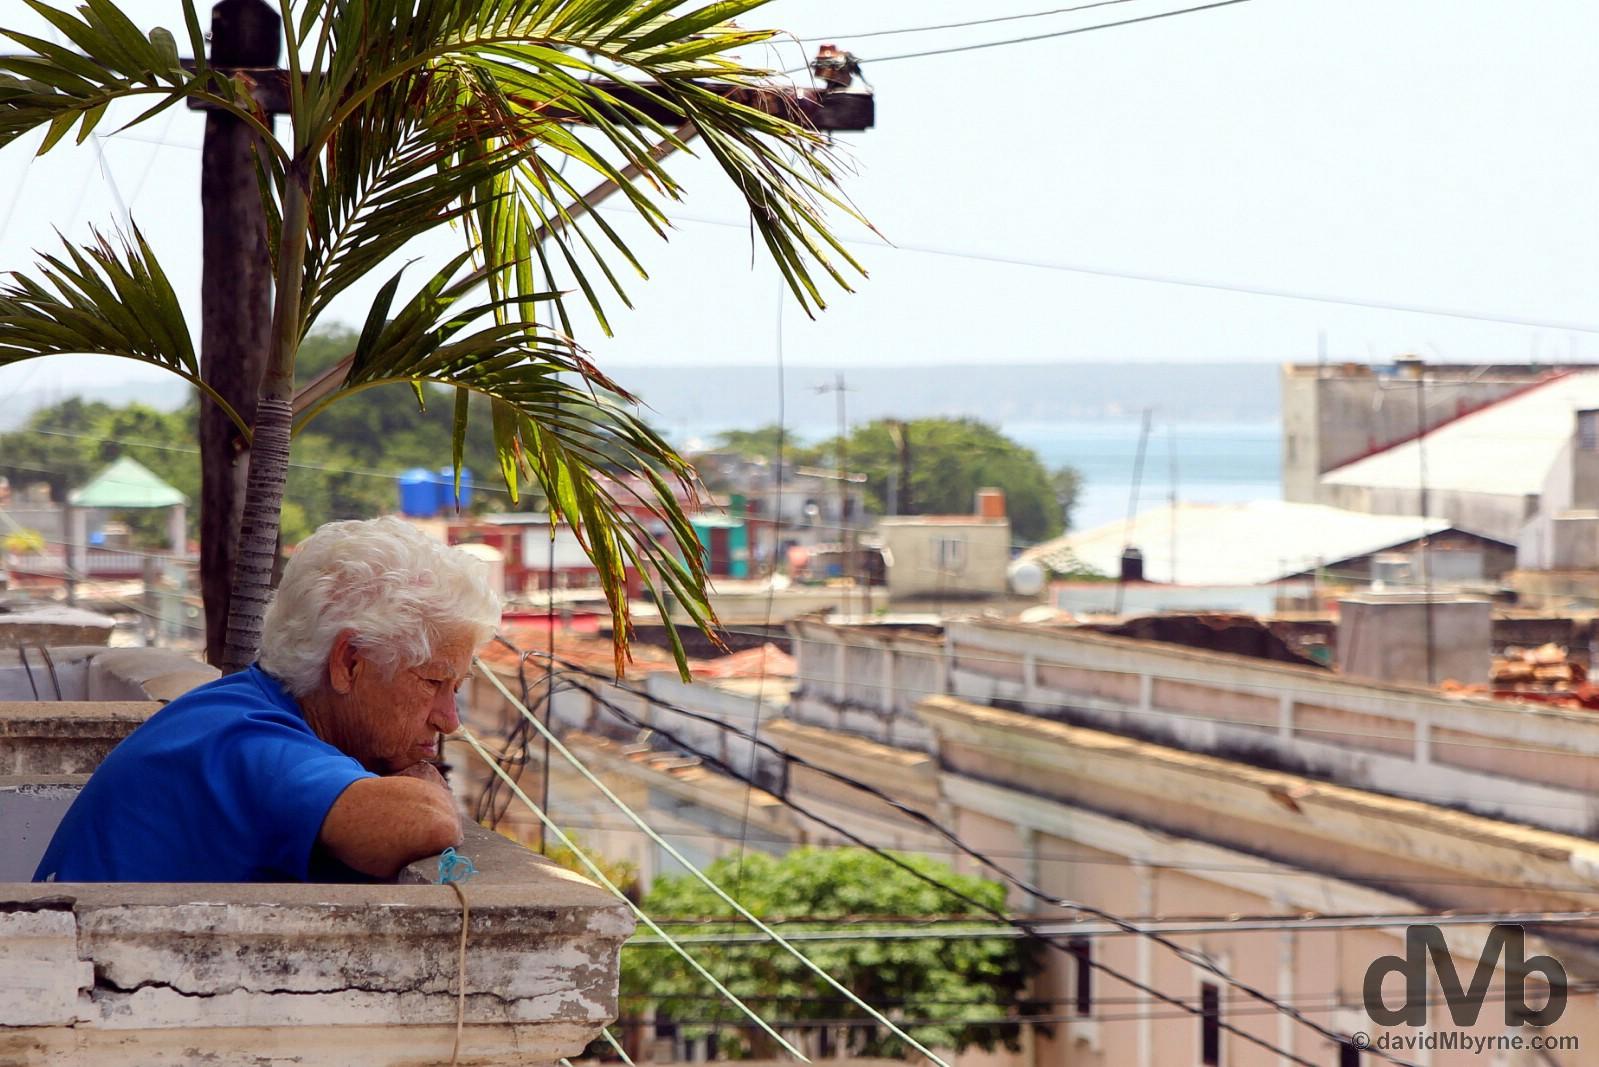 Overlooking Calle 31 in Cienfuegos, Cuba. May 9, 2015.